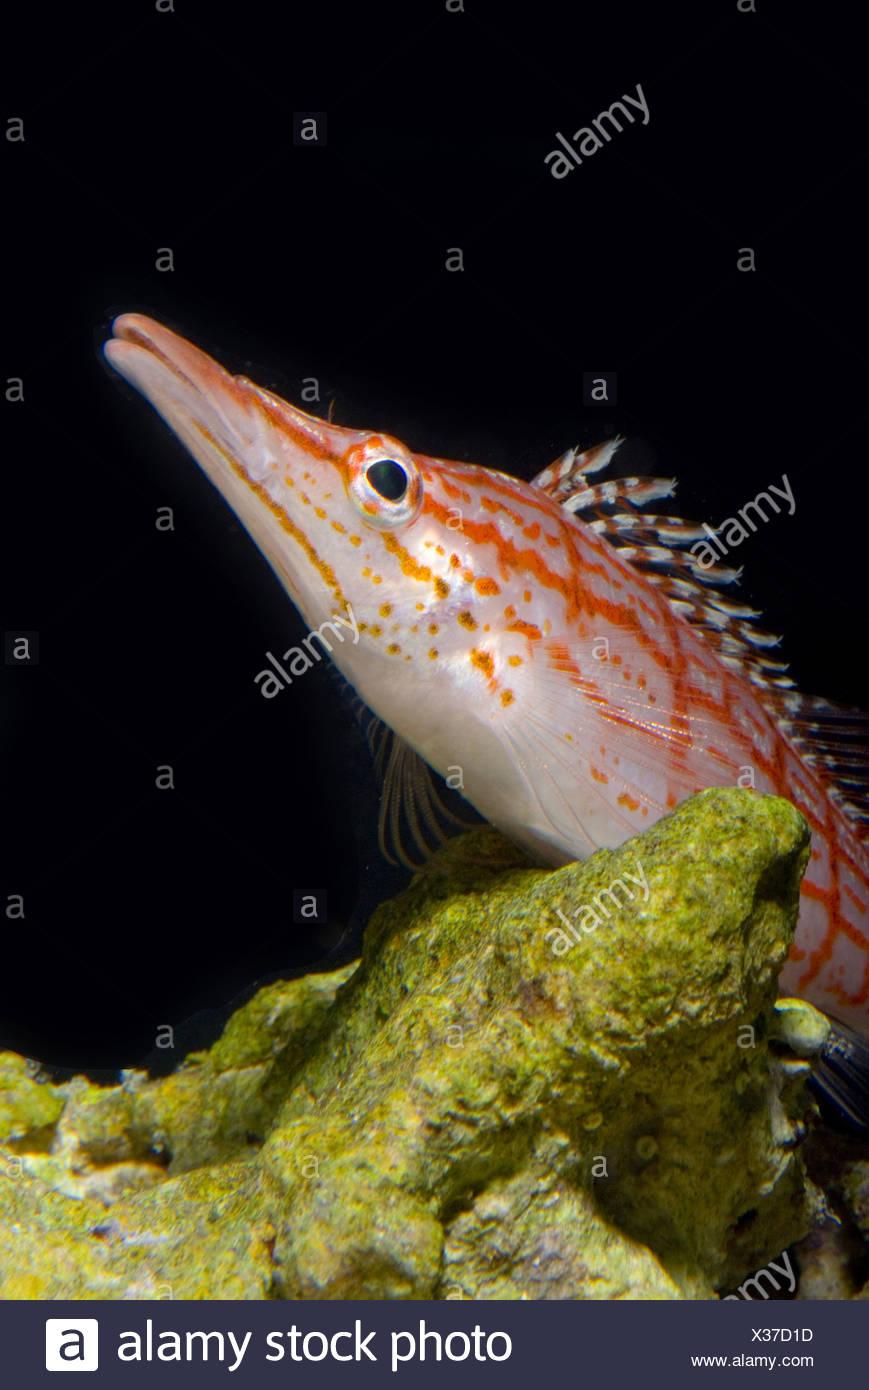 longnose hawkfish, oxycirrhites typus - Stock Image